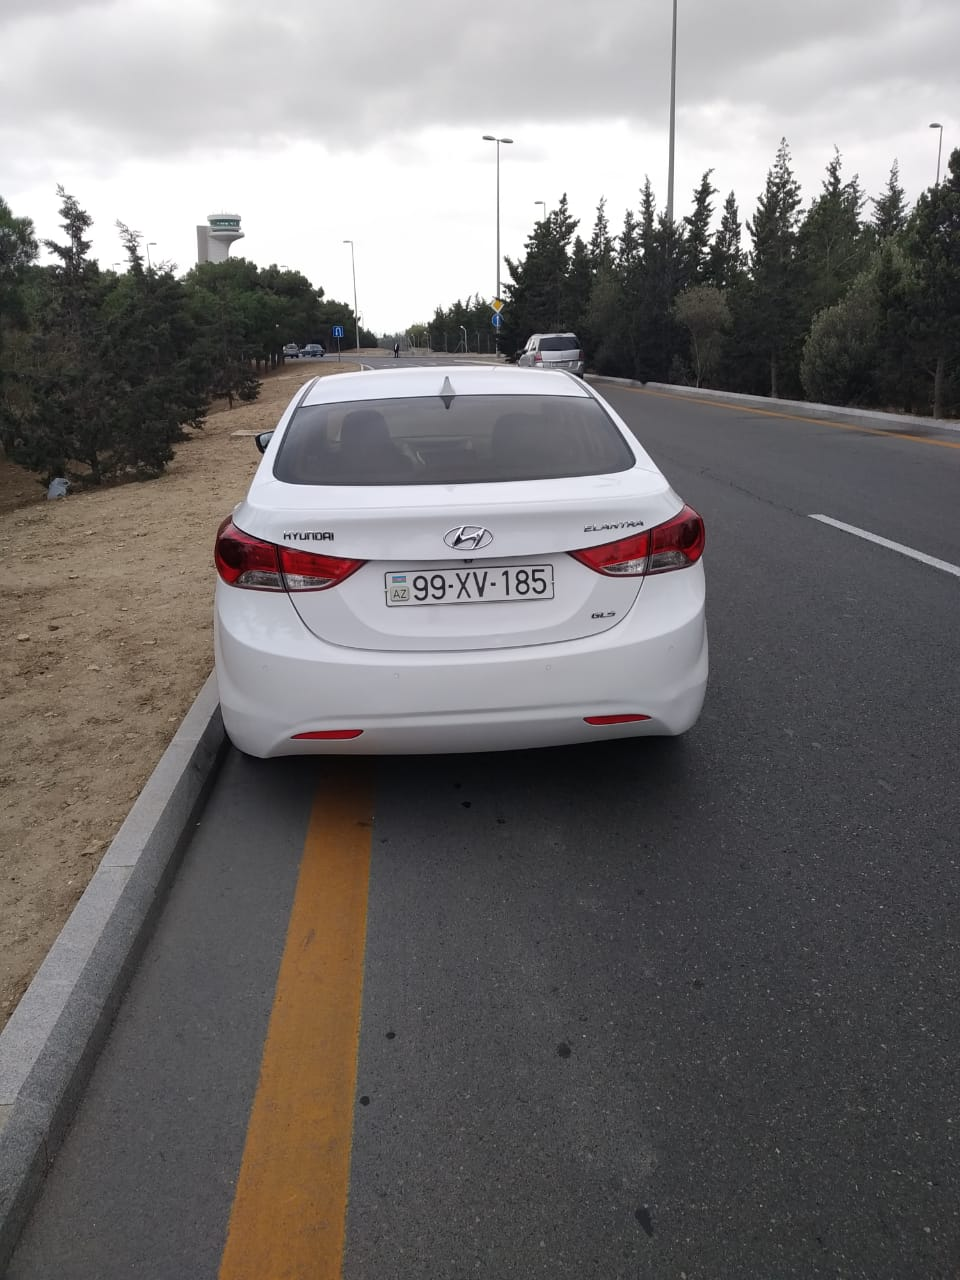 Hyundai Elantra 1.8(lt) 2012 İkinci əl  $3500